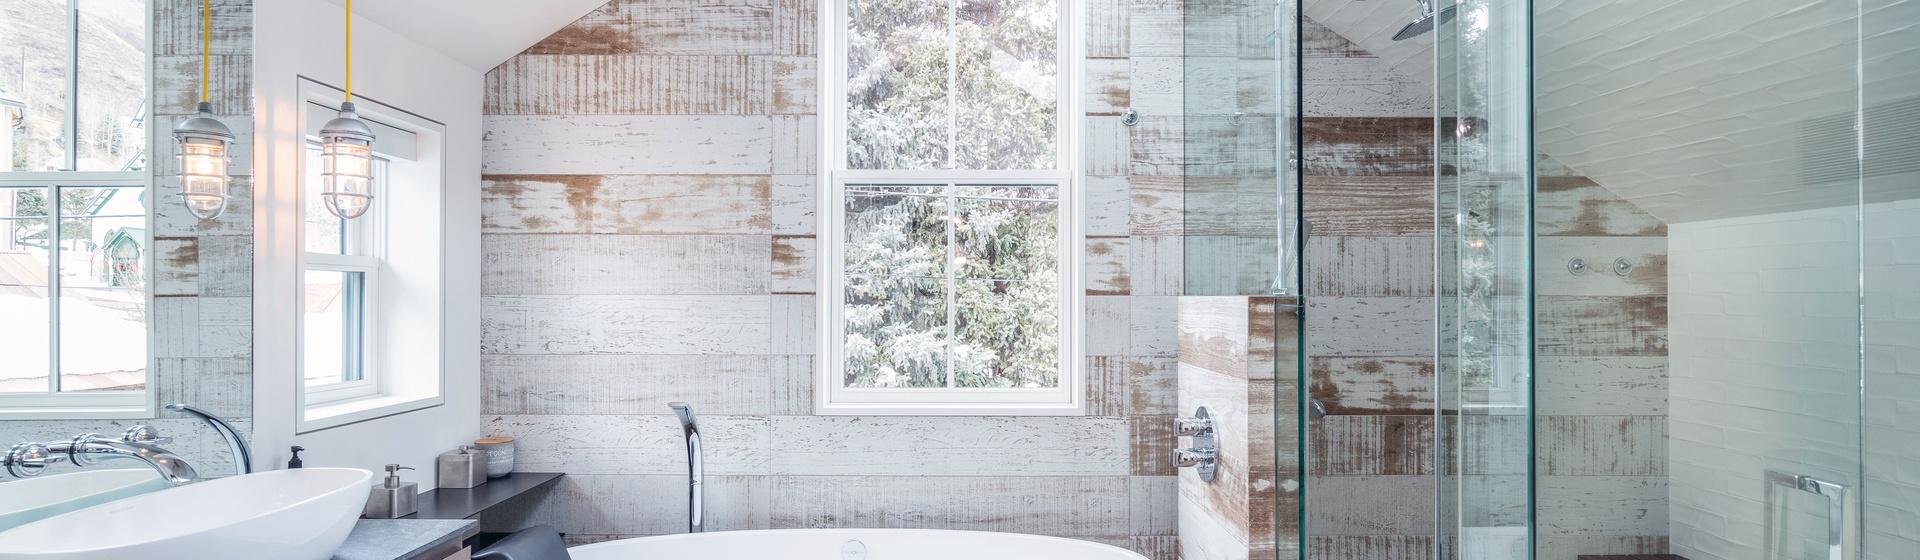 13-Telluride-The-Sunnyside-Main-Level-Master-Bathroom-Web.jpg